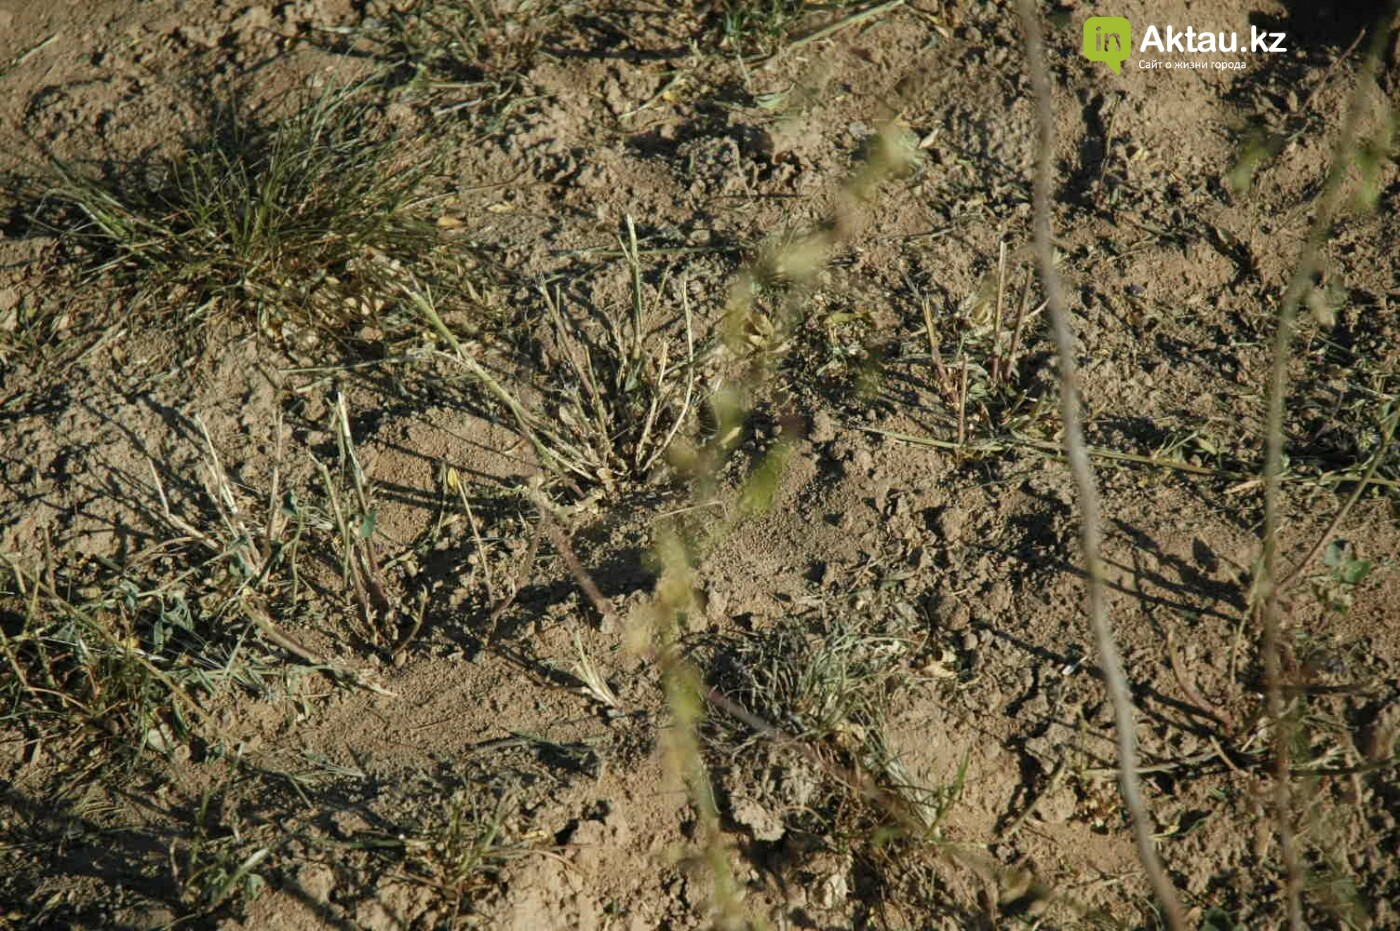 Погибшие от засухи и обезвоживания в Актау исчисляются десятками (ФОТО), фото-8